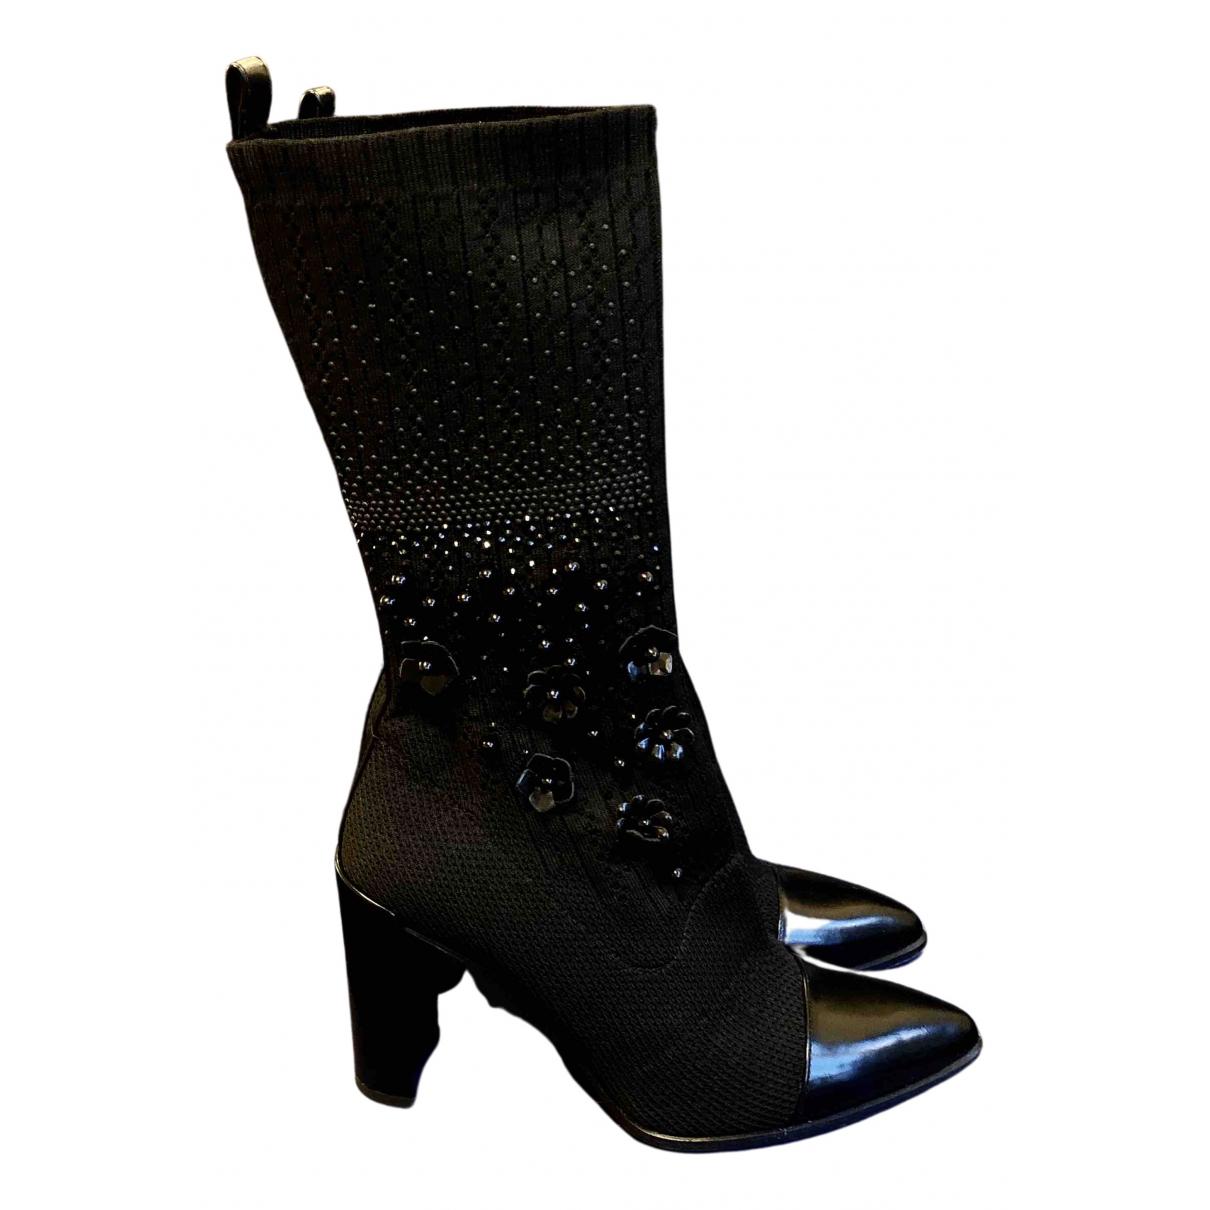 Stuart Weitzman N Black Patent leather Boots for Women 38 EU